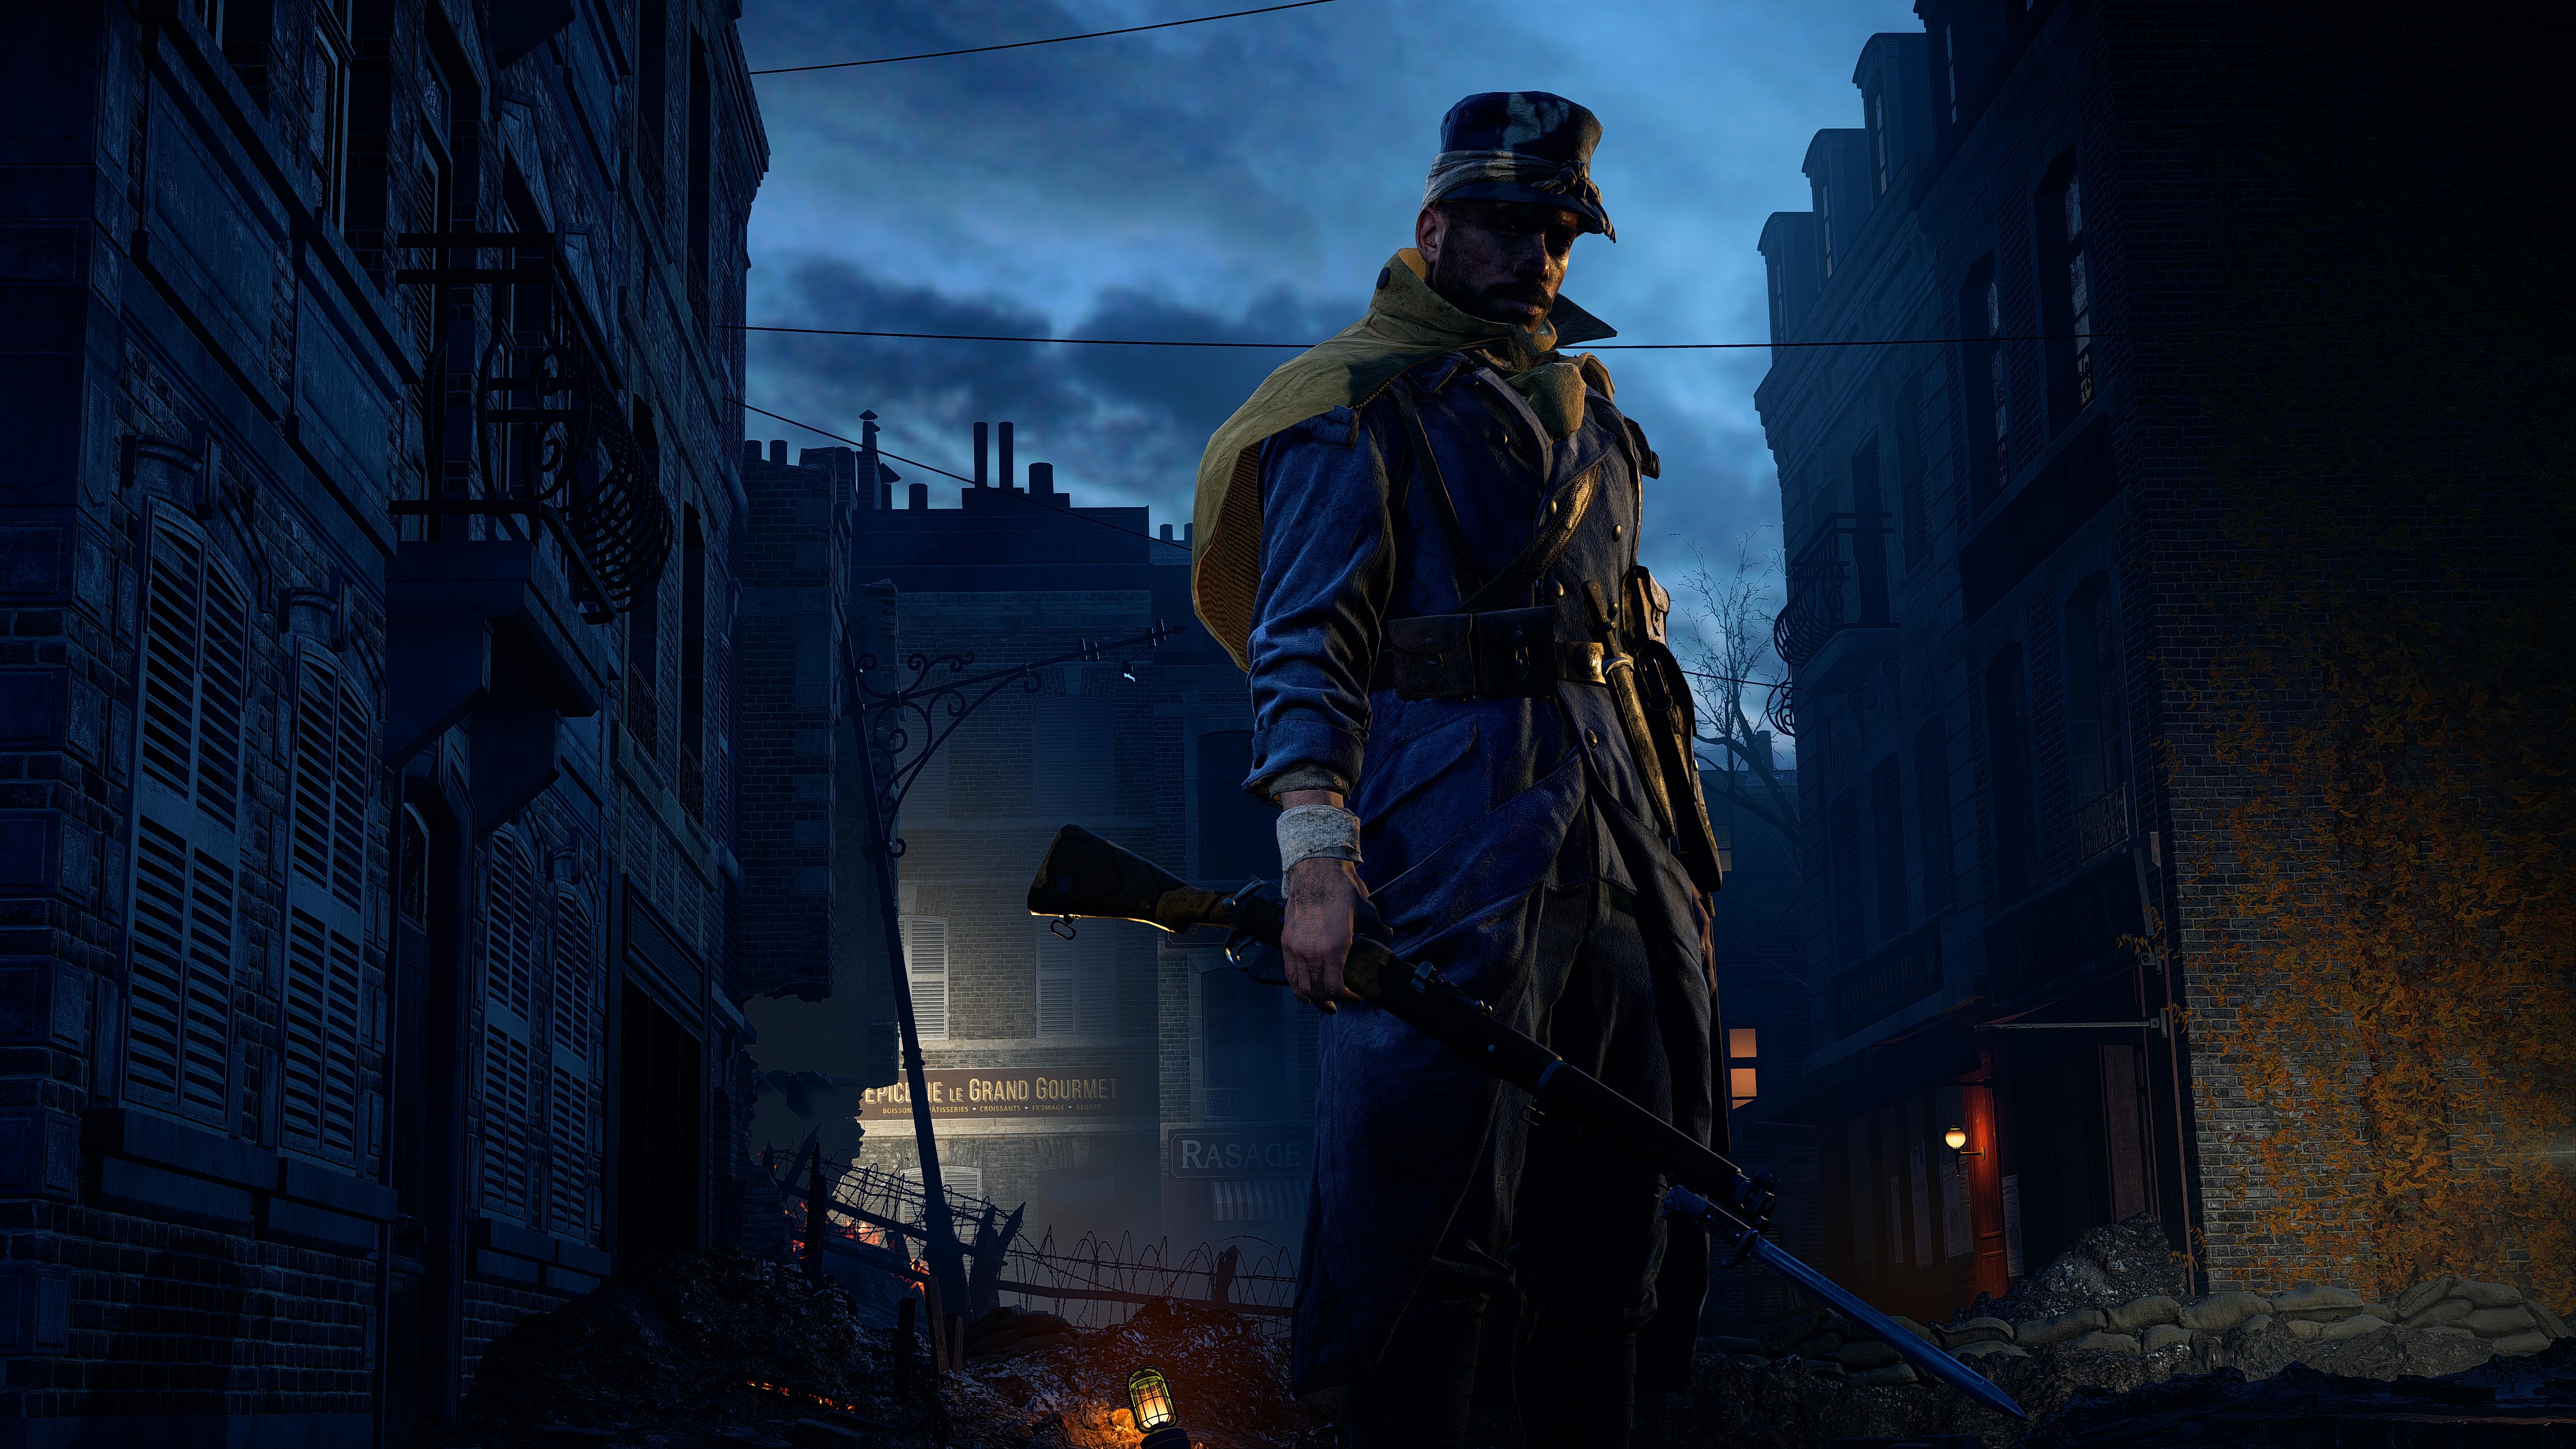 5k Battlefield 1, HD Games, 4k Wallpapers, Images